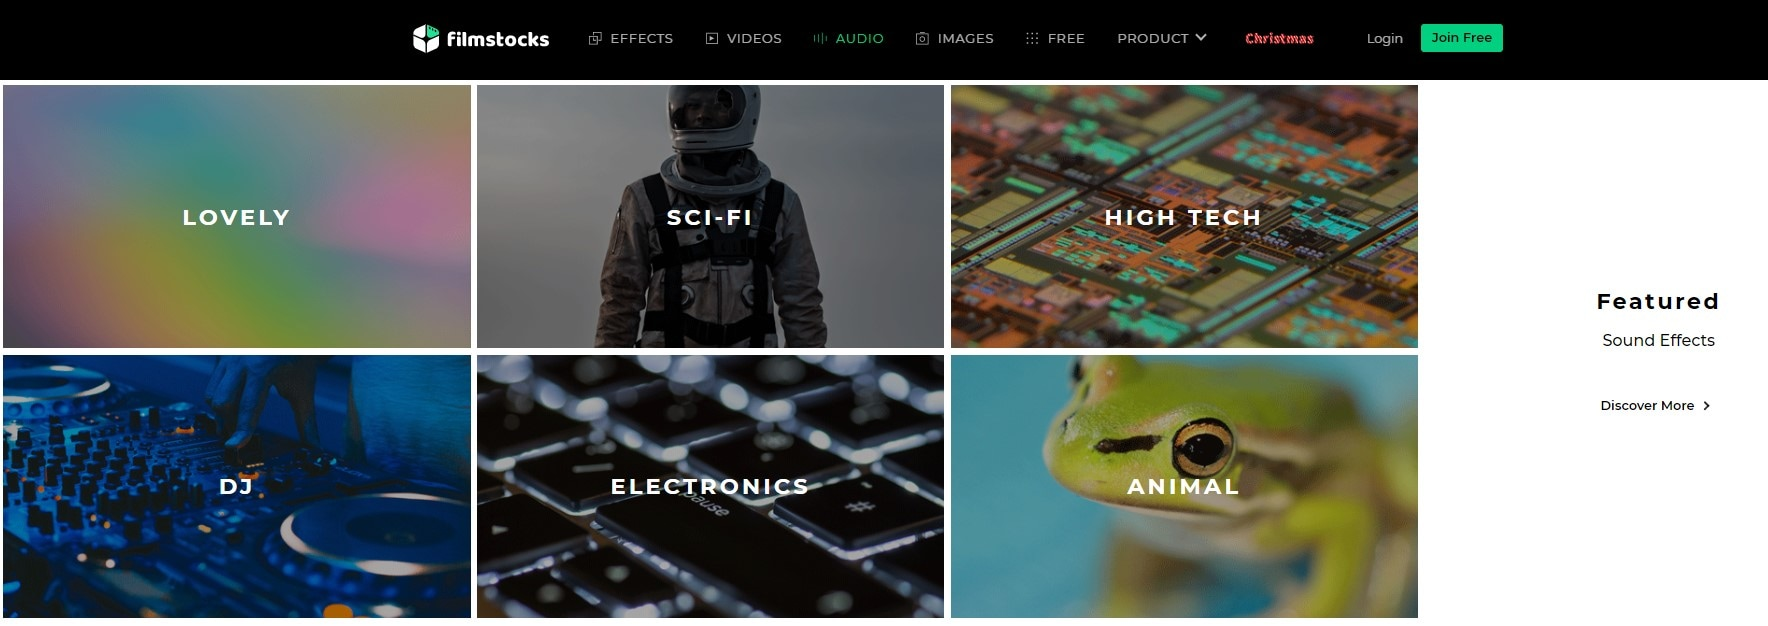 Filmstock sound effects web